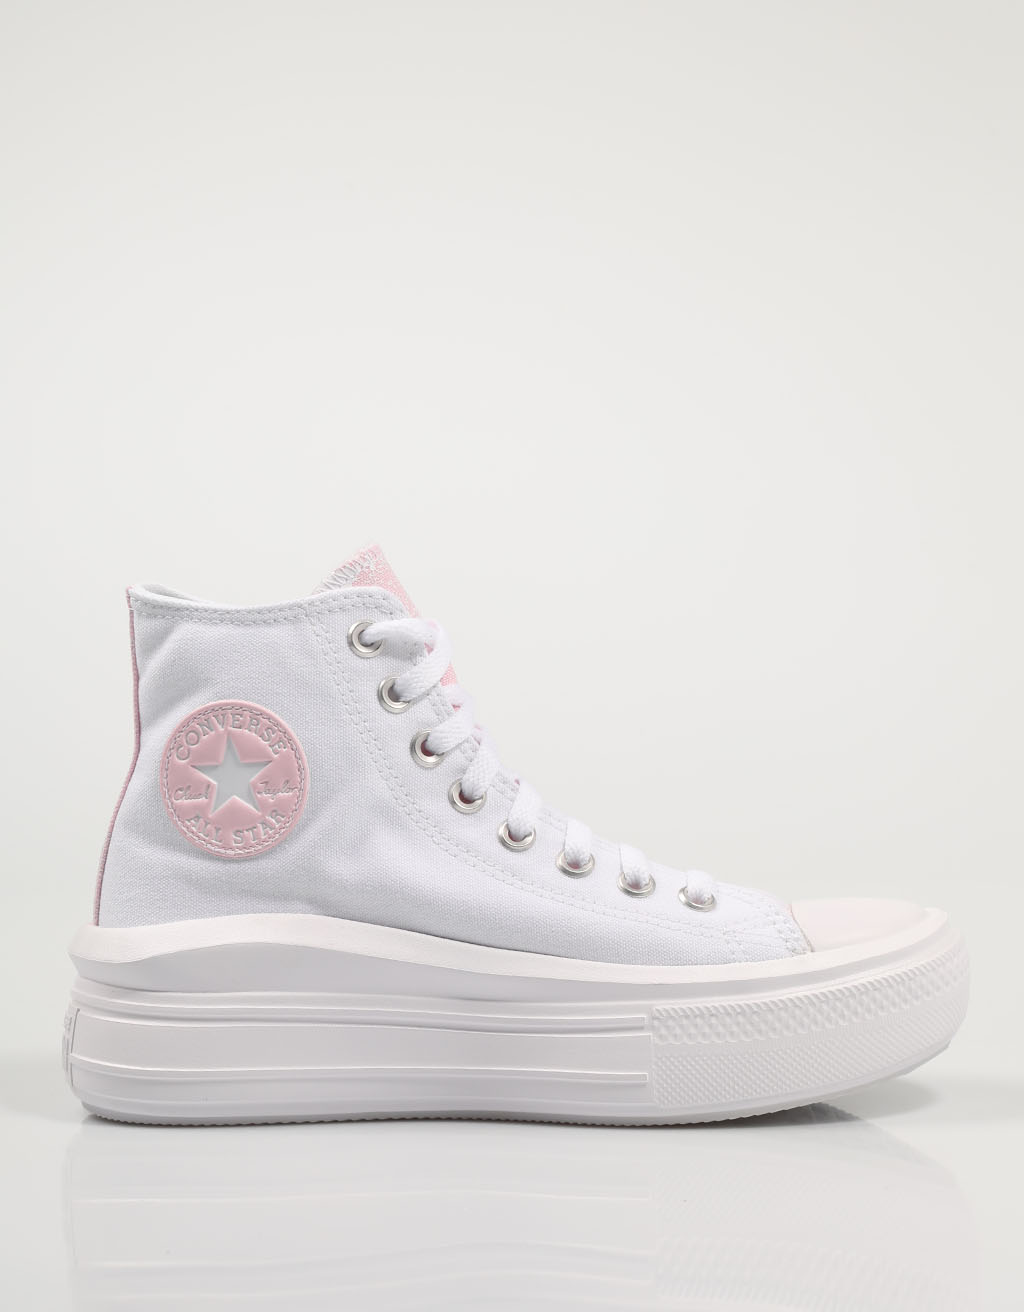 CONVERSE ZAPATILLAS CTAS MOVE WHITE 571577C Blanco Lona Mujer – White SNEAKERS Woman Shoes Casual Fashion 76501